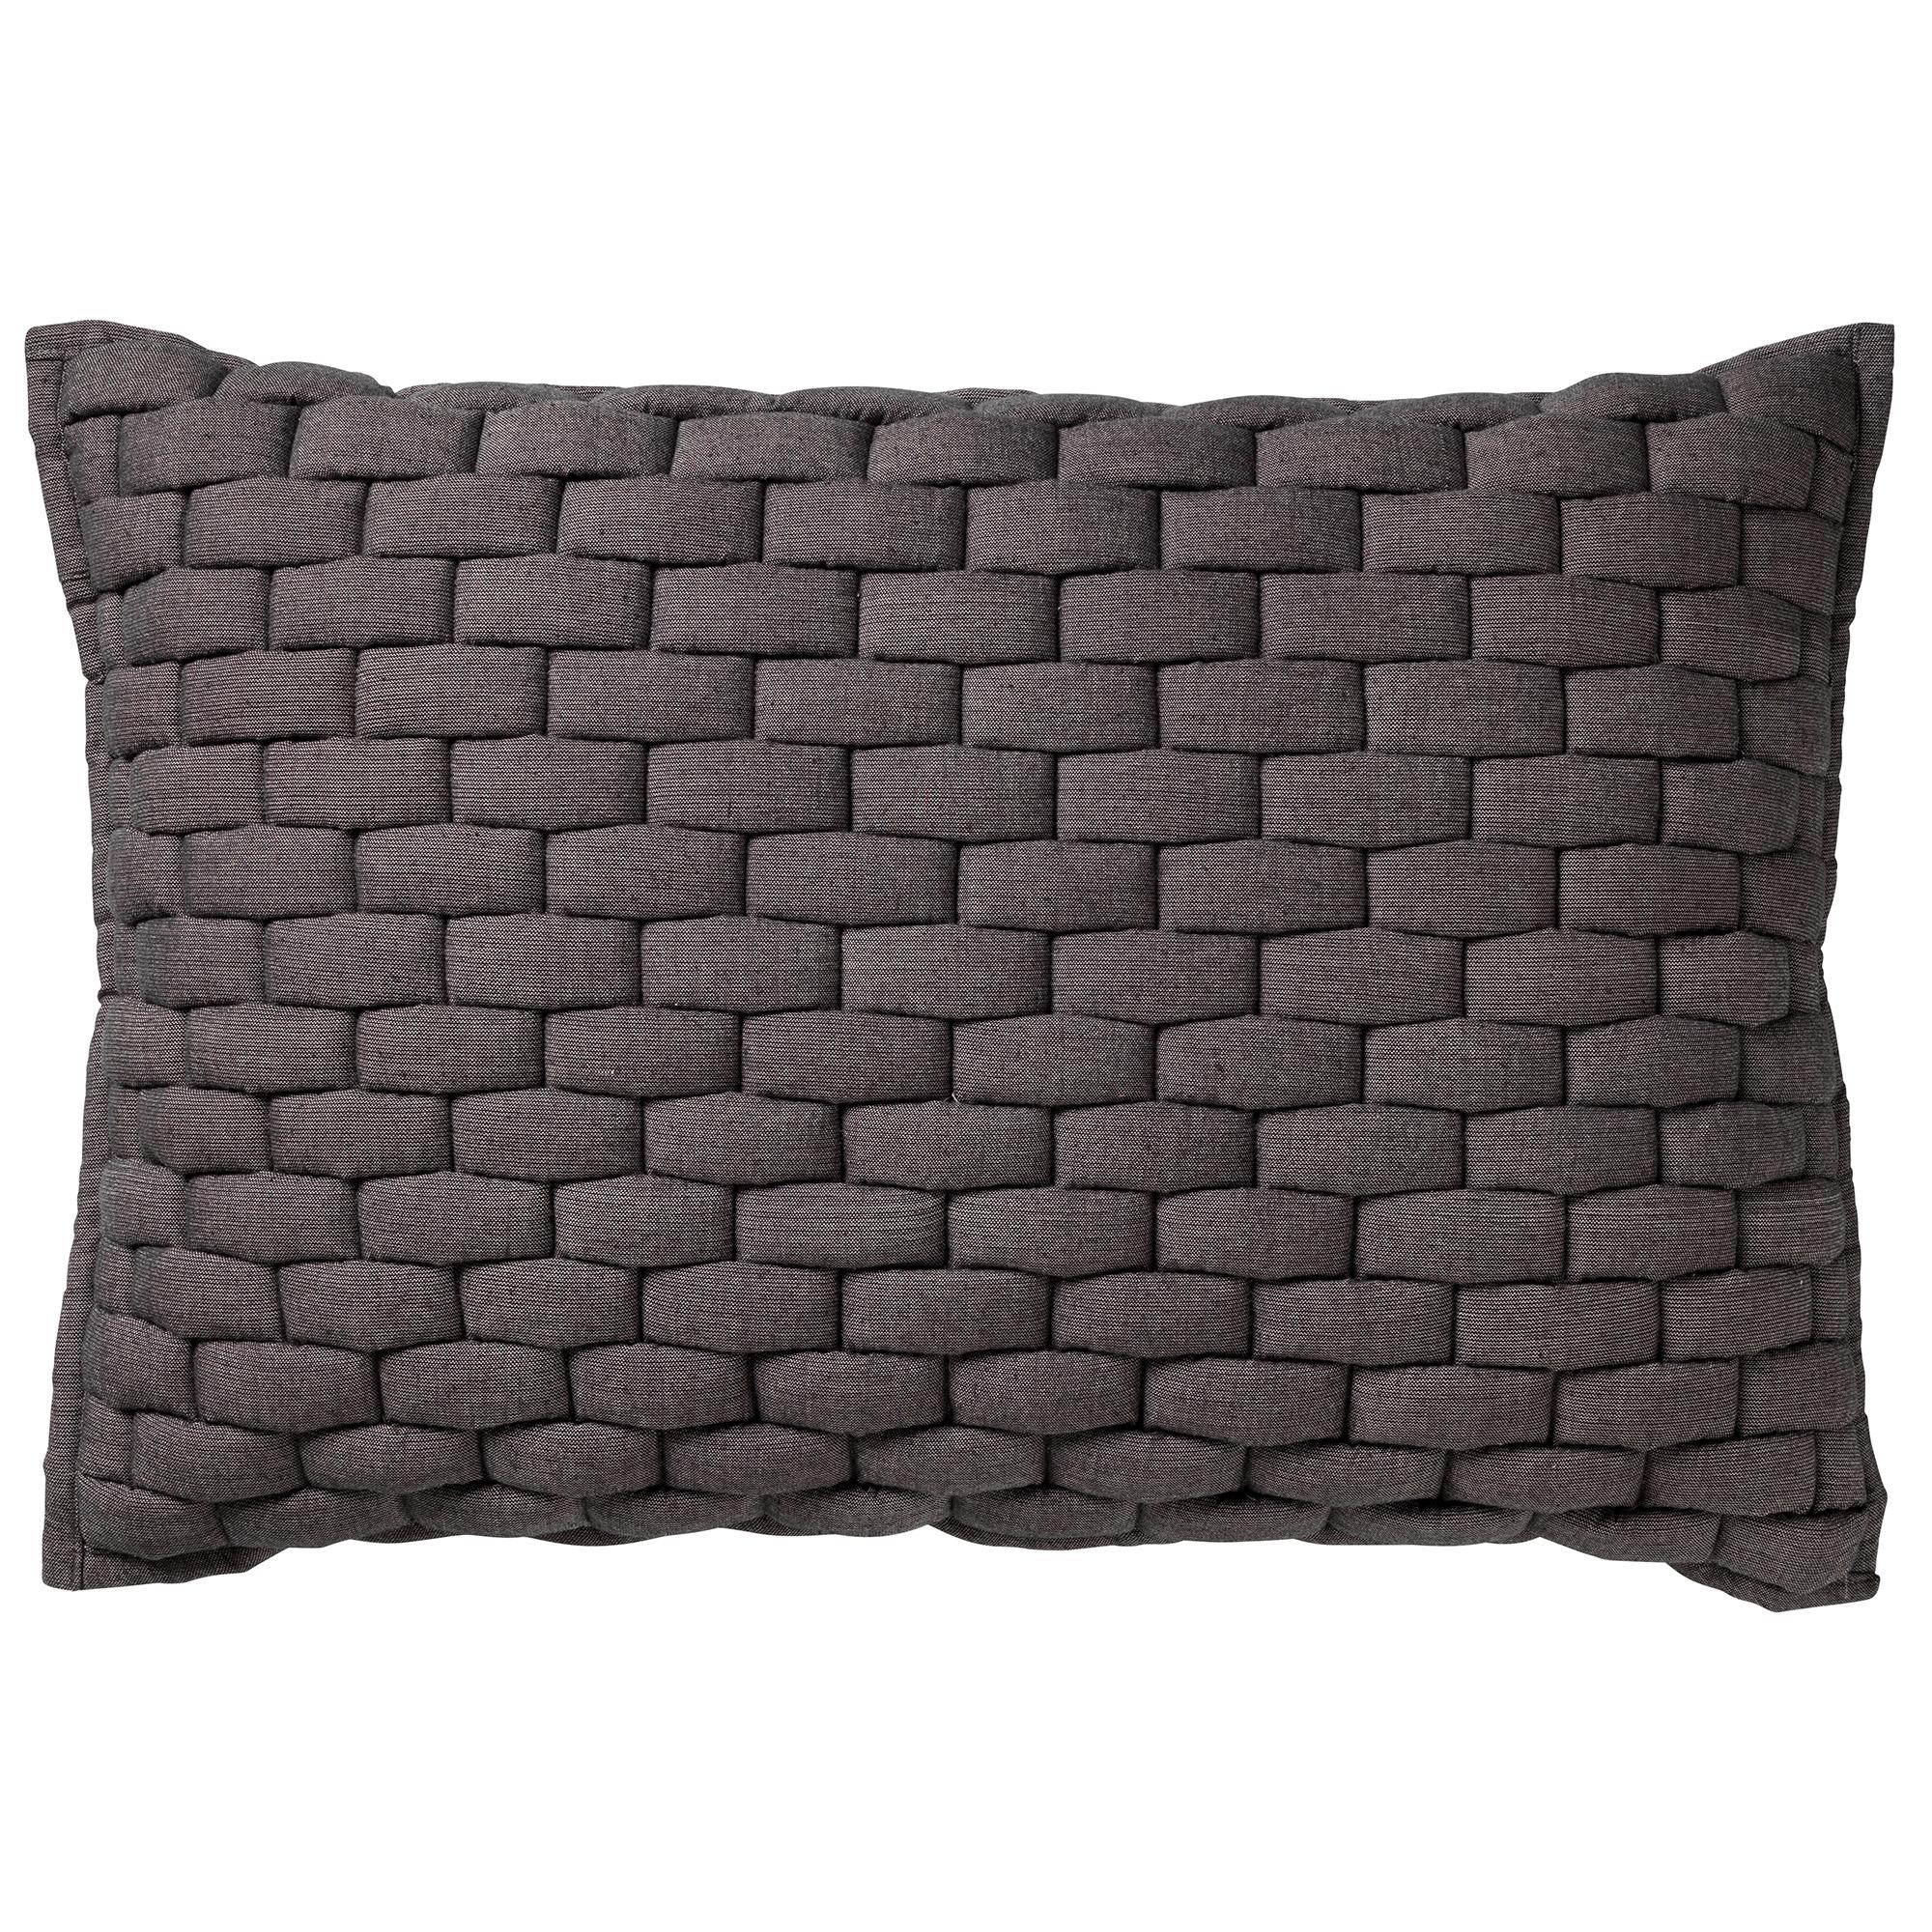 LINA - Sierkussen Charcoal Grey 40x60 cm